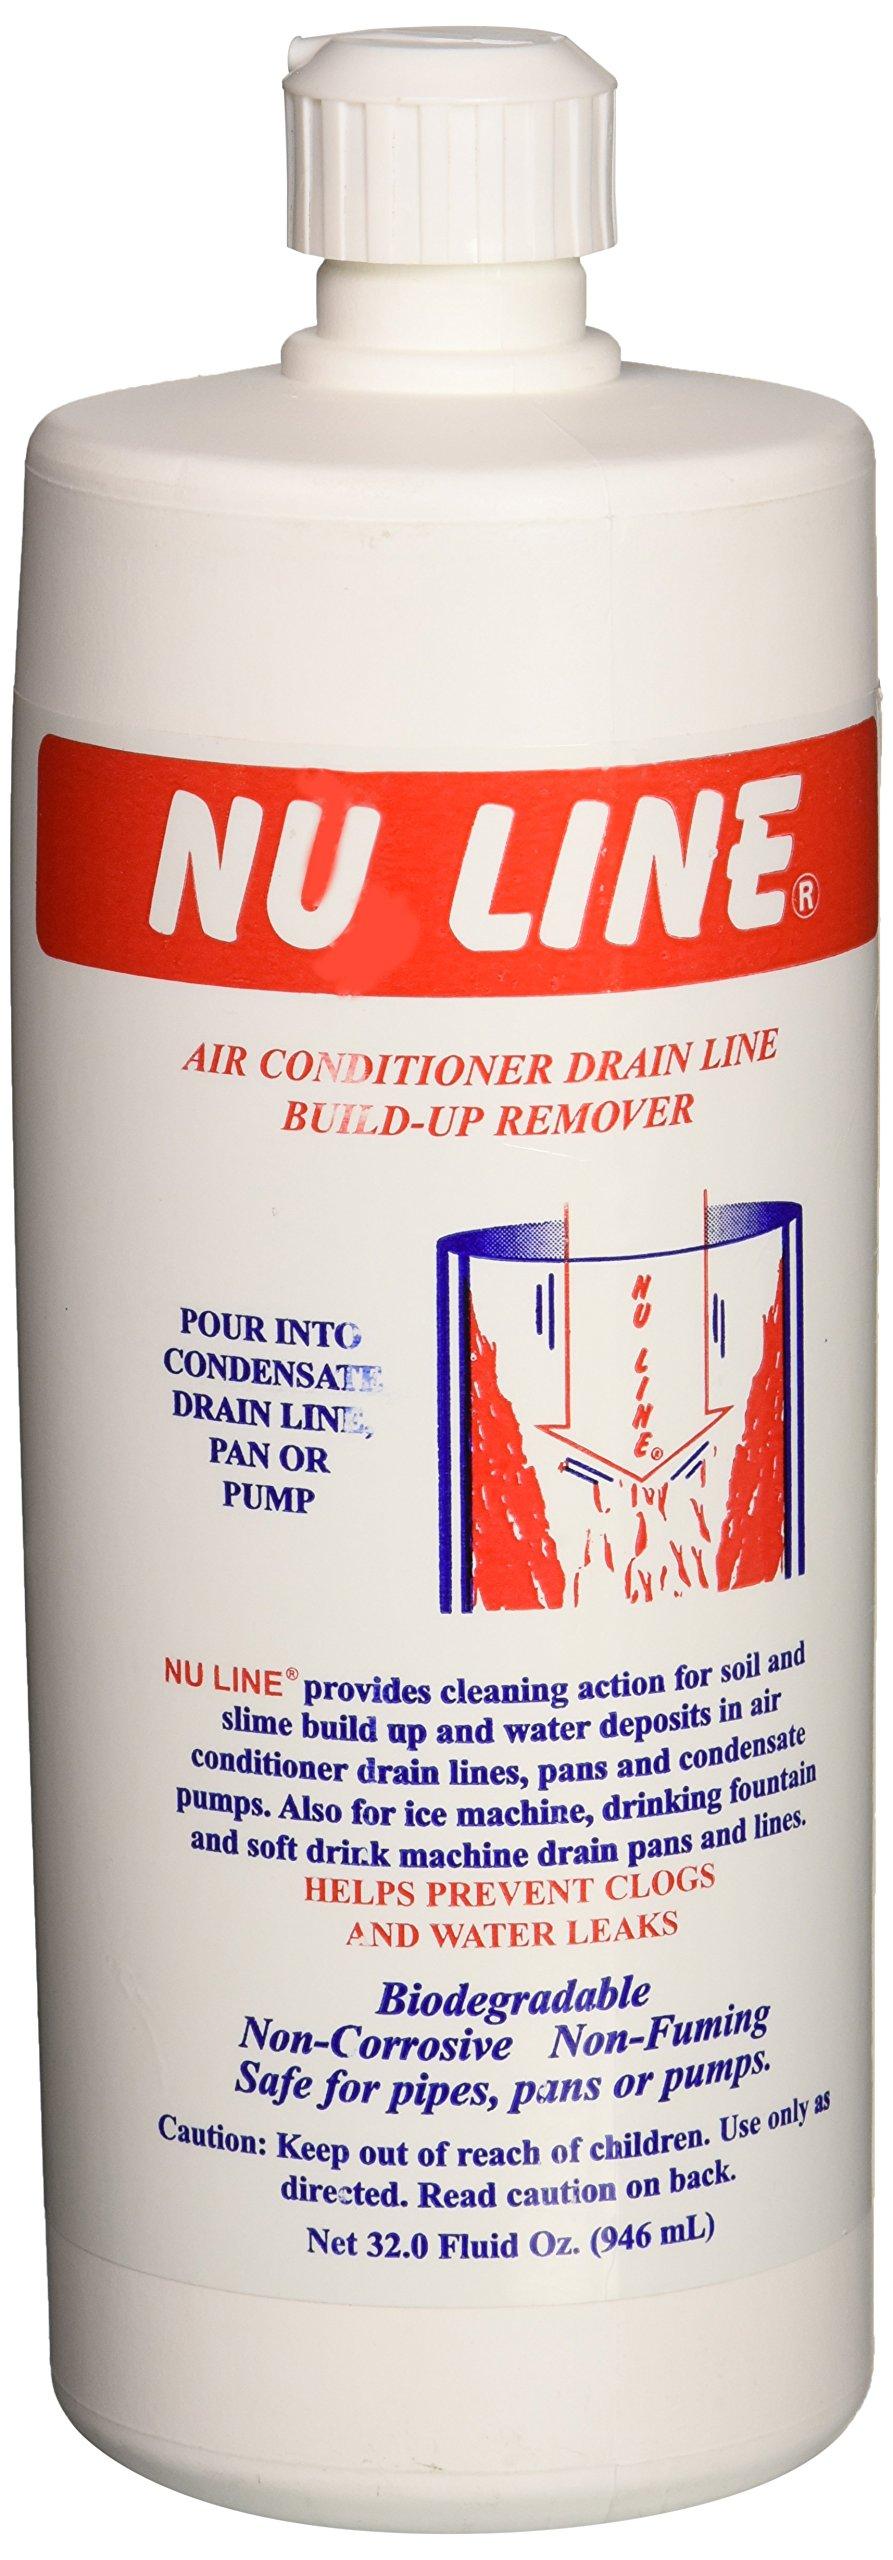 Rectorseal 97690 Nu Line A/C Condensate Drain Cleaner, 32 oz